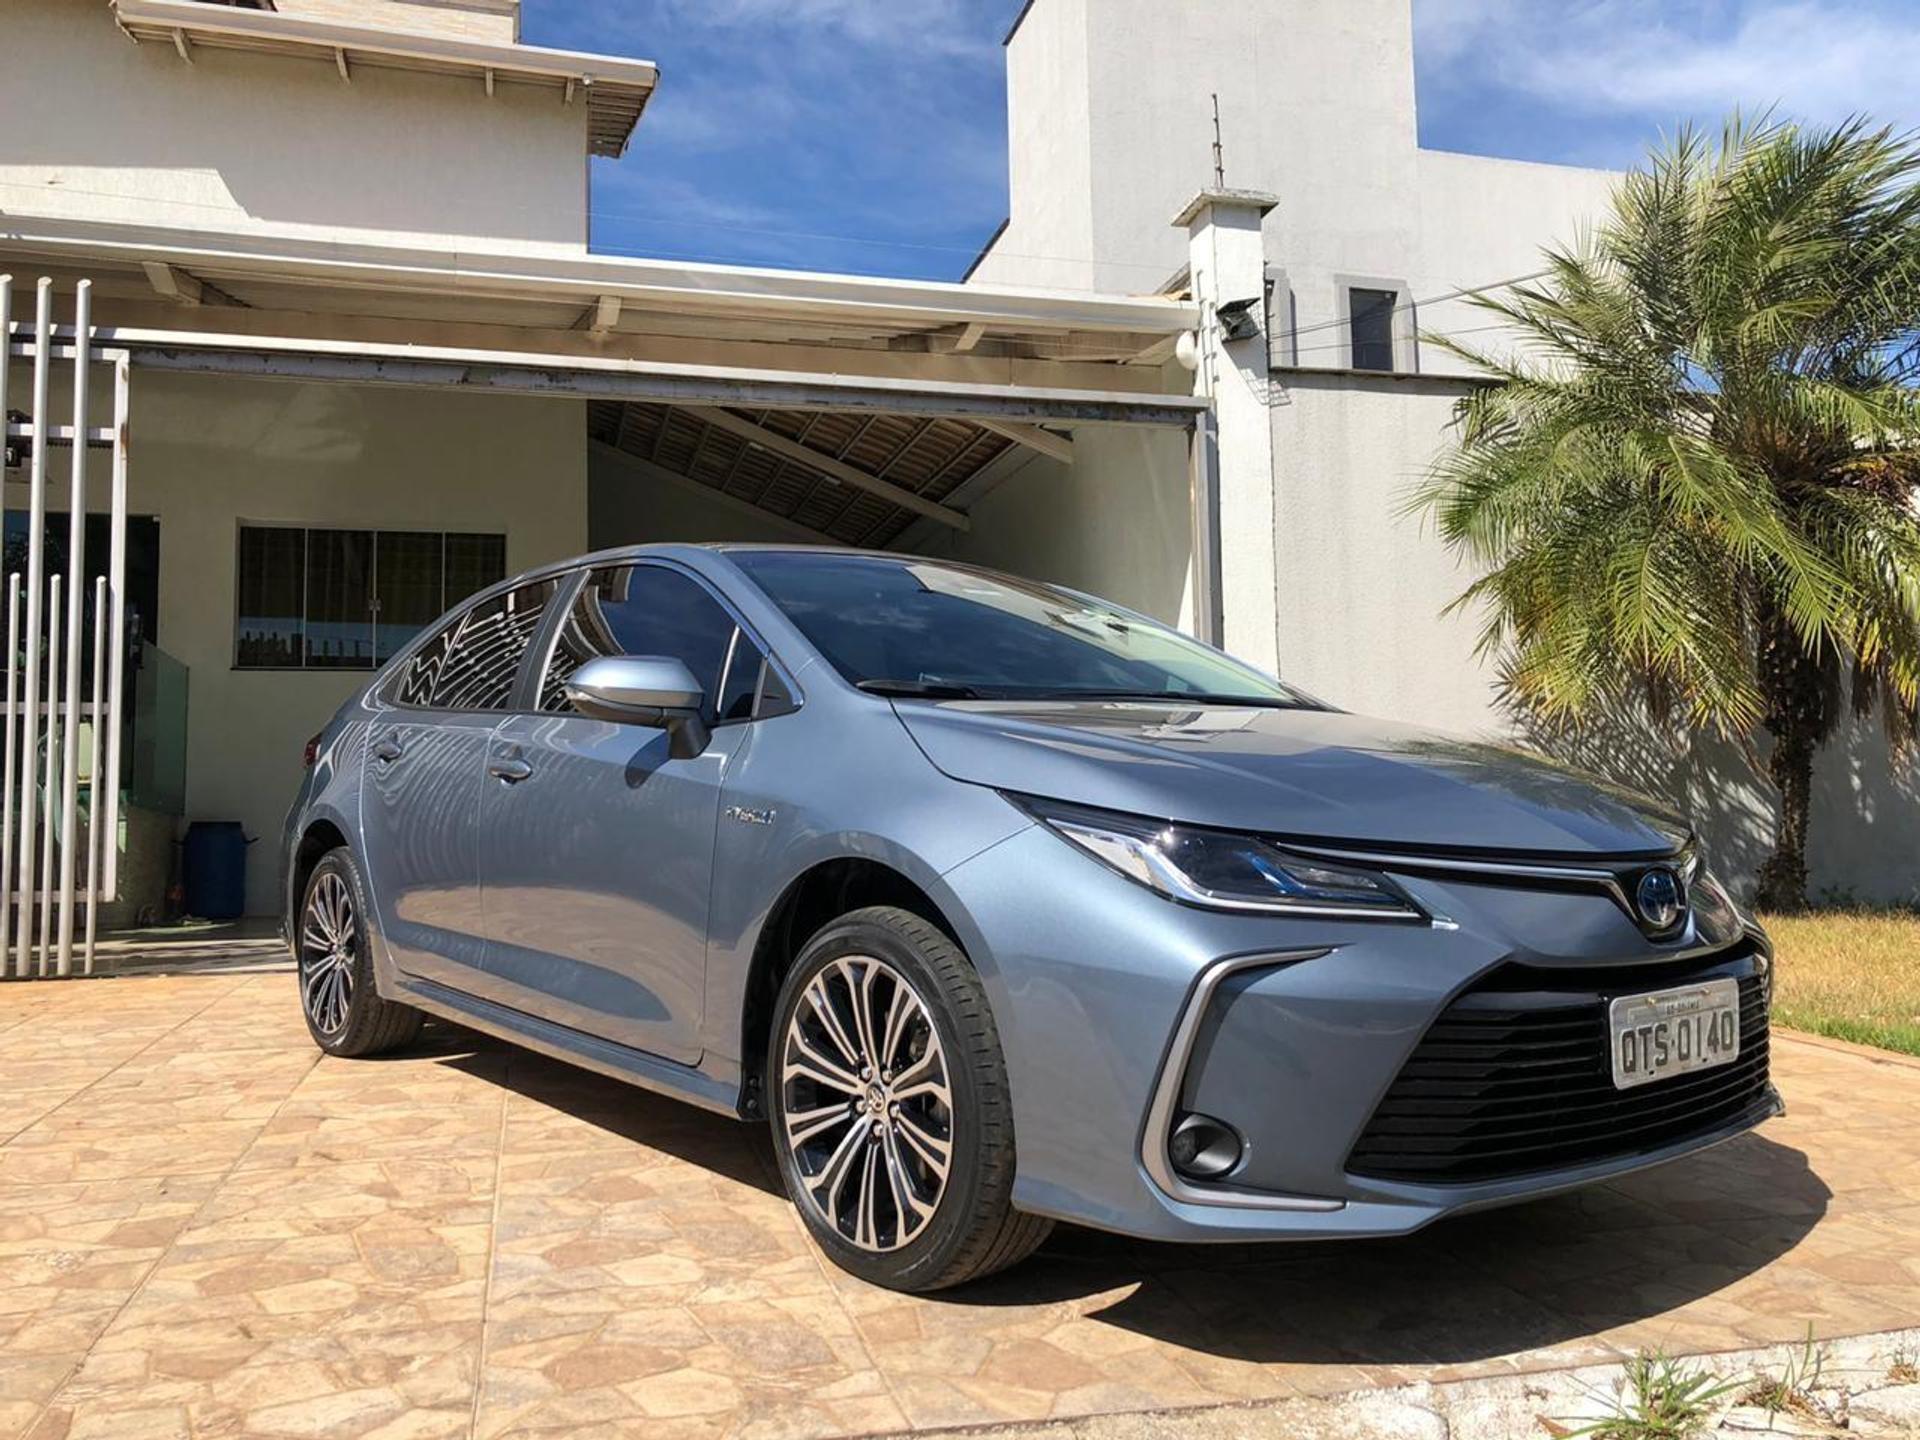 Toyota Corolla 1.8 Vvti Hybrid Flex Altis Cvt Wmimagem17100733561